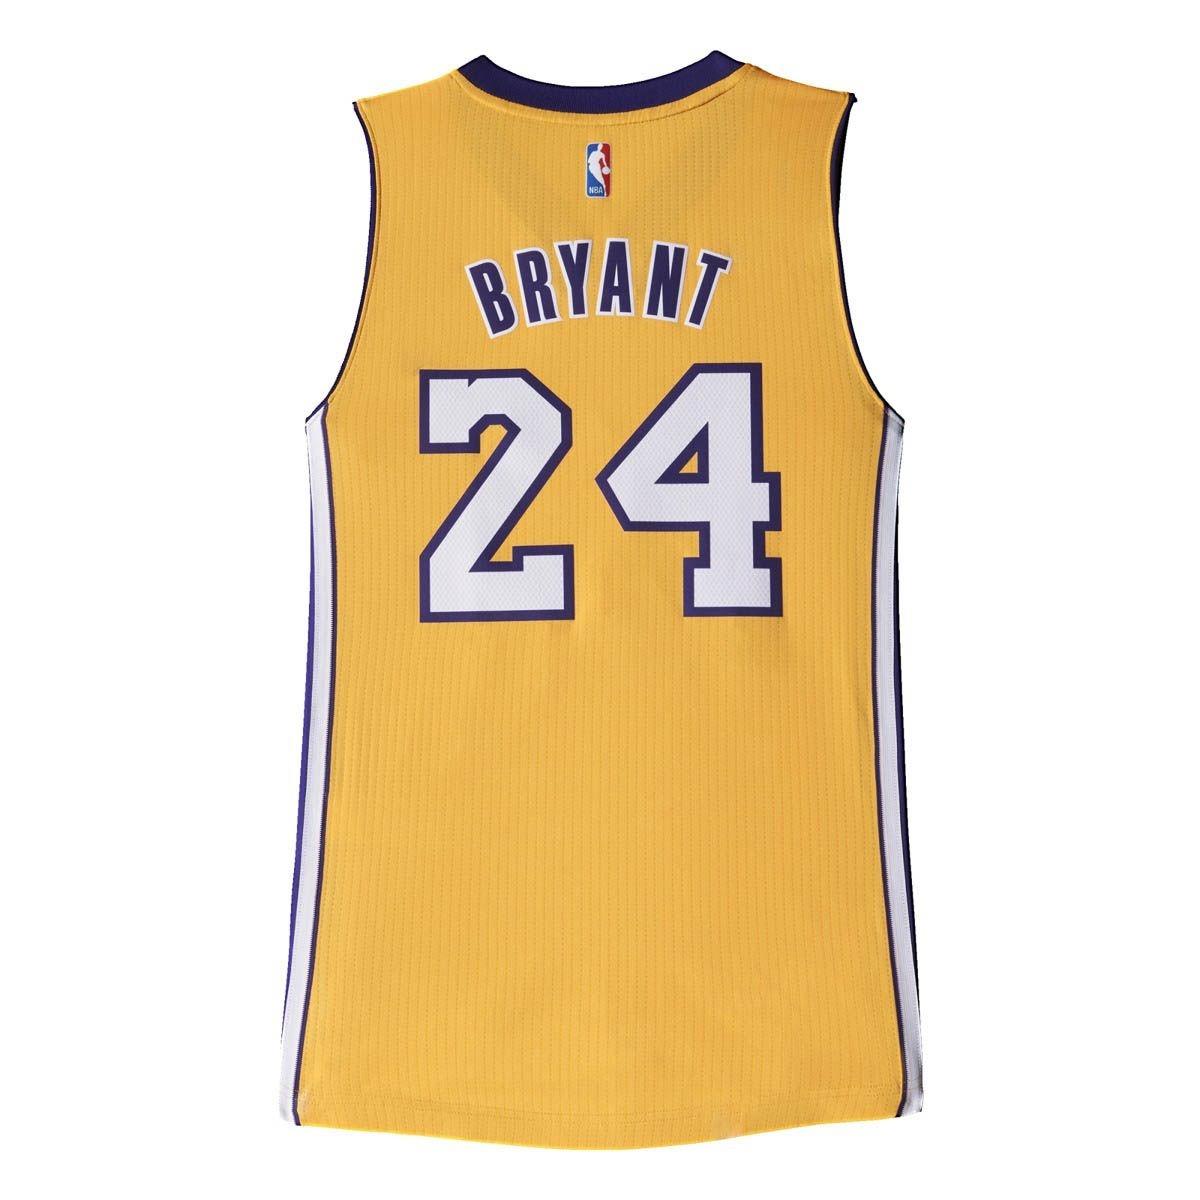 Camisa Regata adidas Nba Swingman Los Angeles Lakers Orig+nf - R ... 20134b4c73627